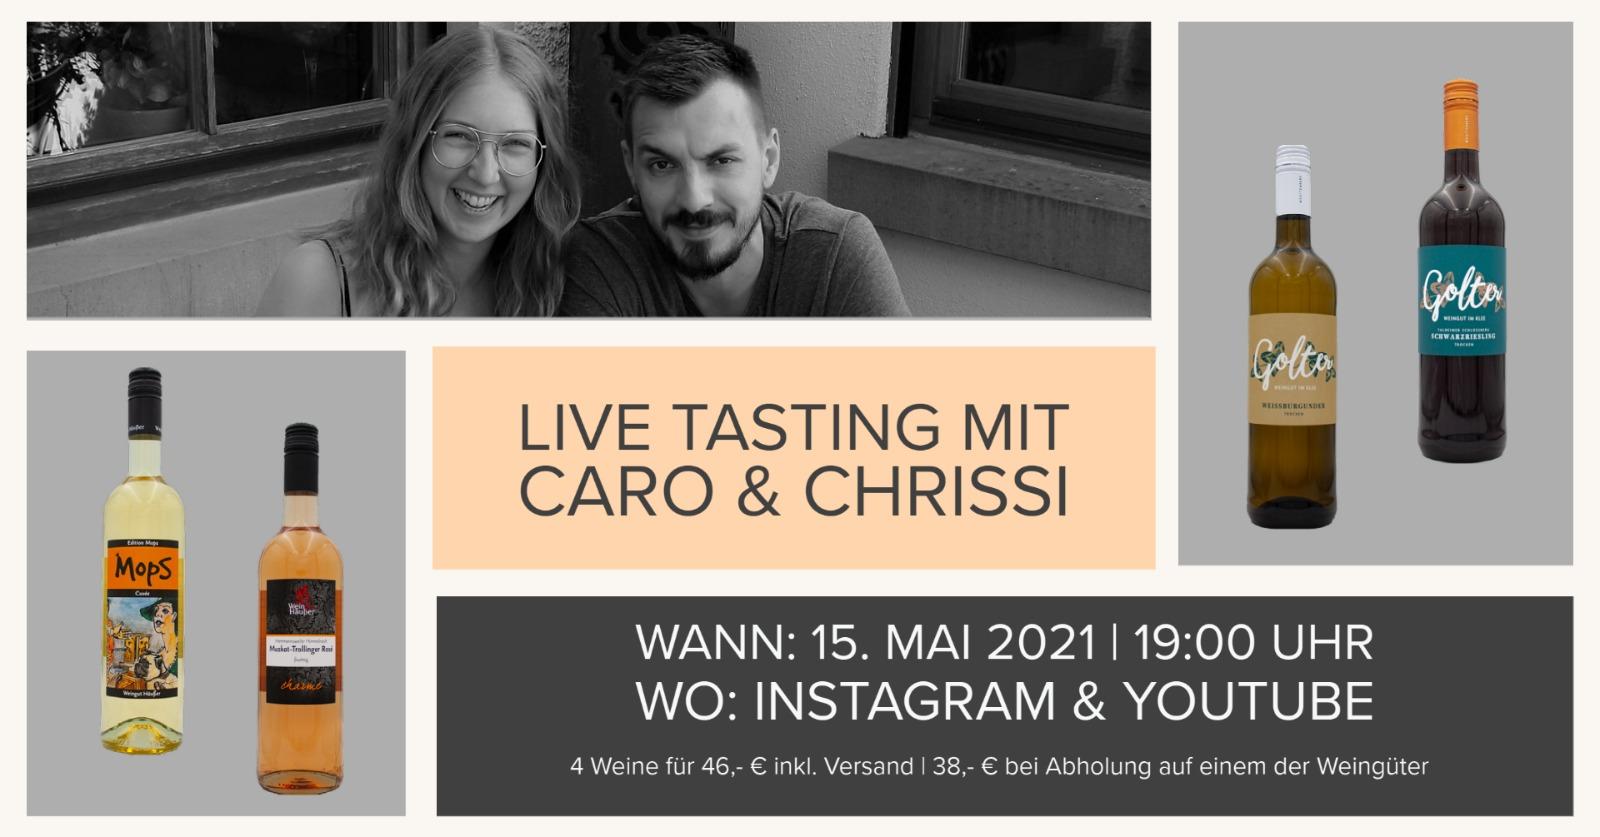 3. Live Tasting mit Caro & Chrissi